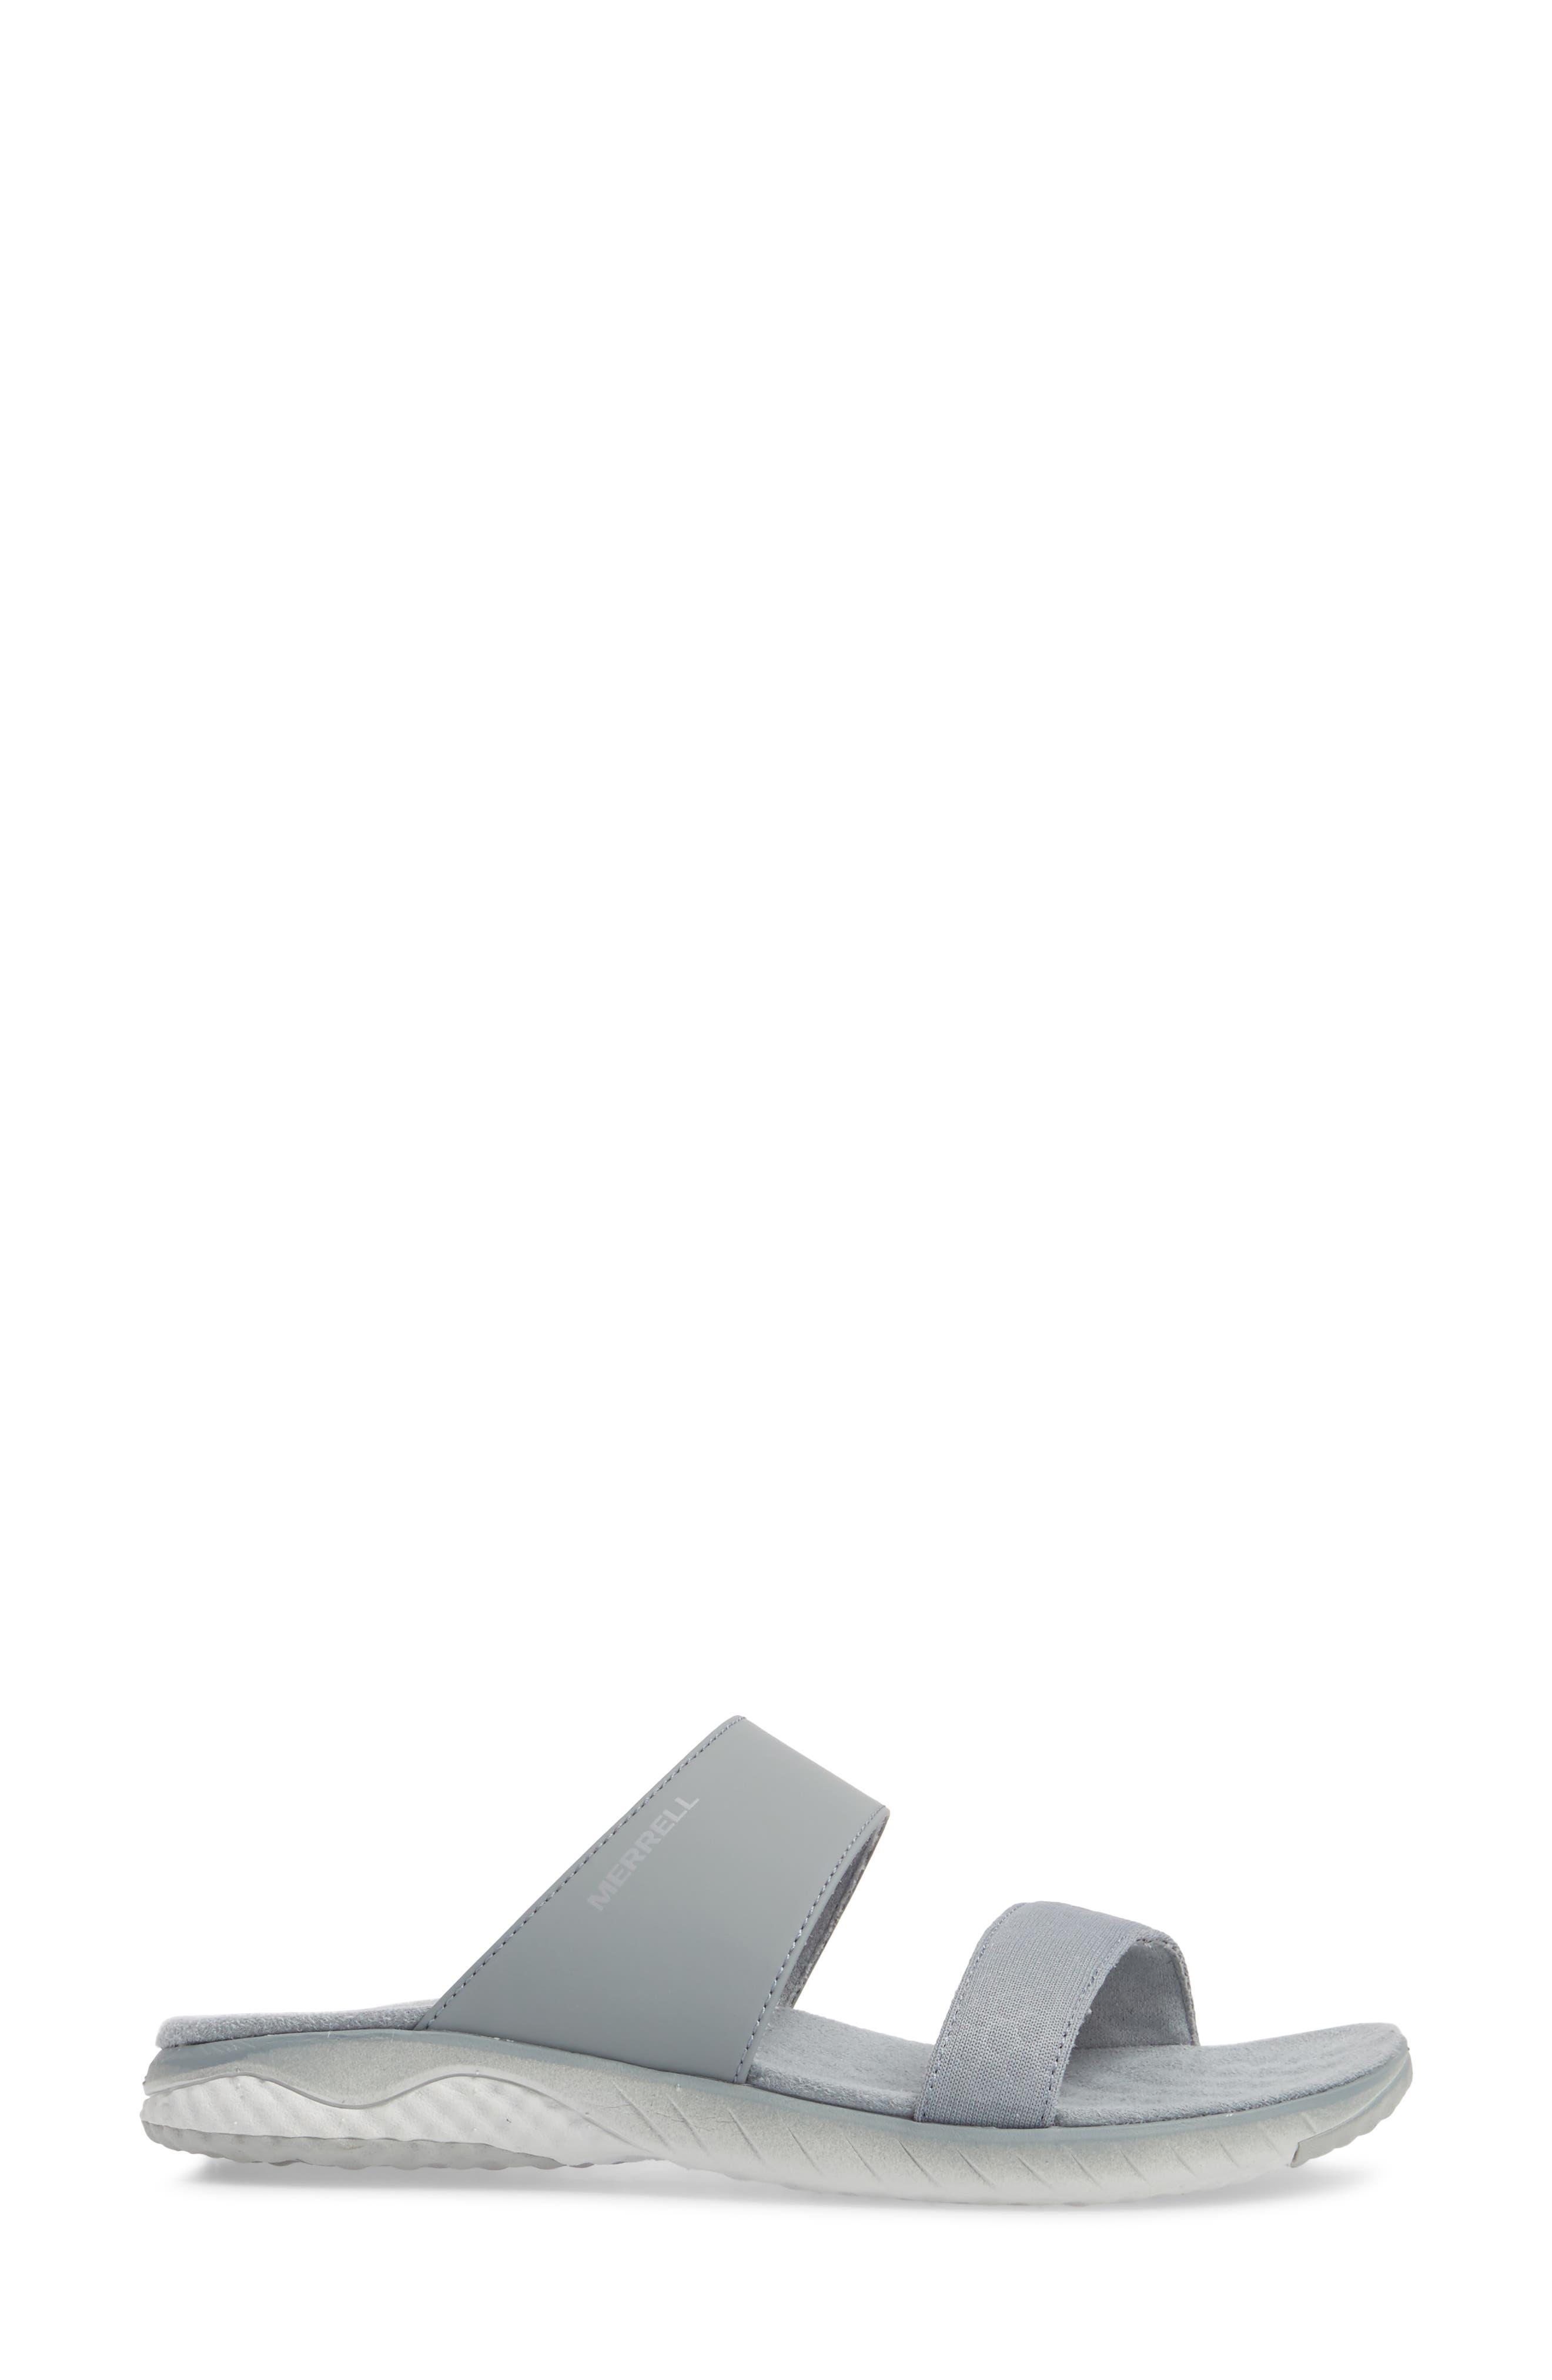 1SIX8 Linna Air Cushion+ Slide Sandal,                             Alternate thumbnail 10, color,